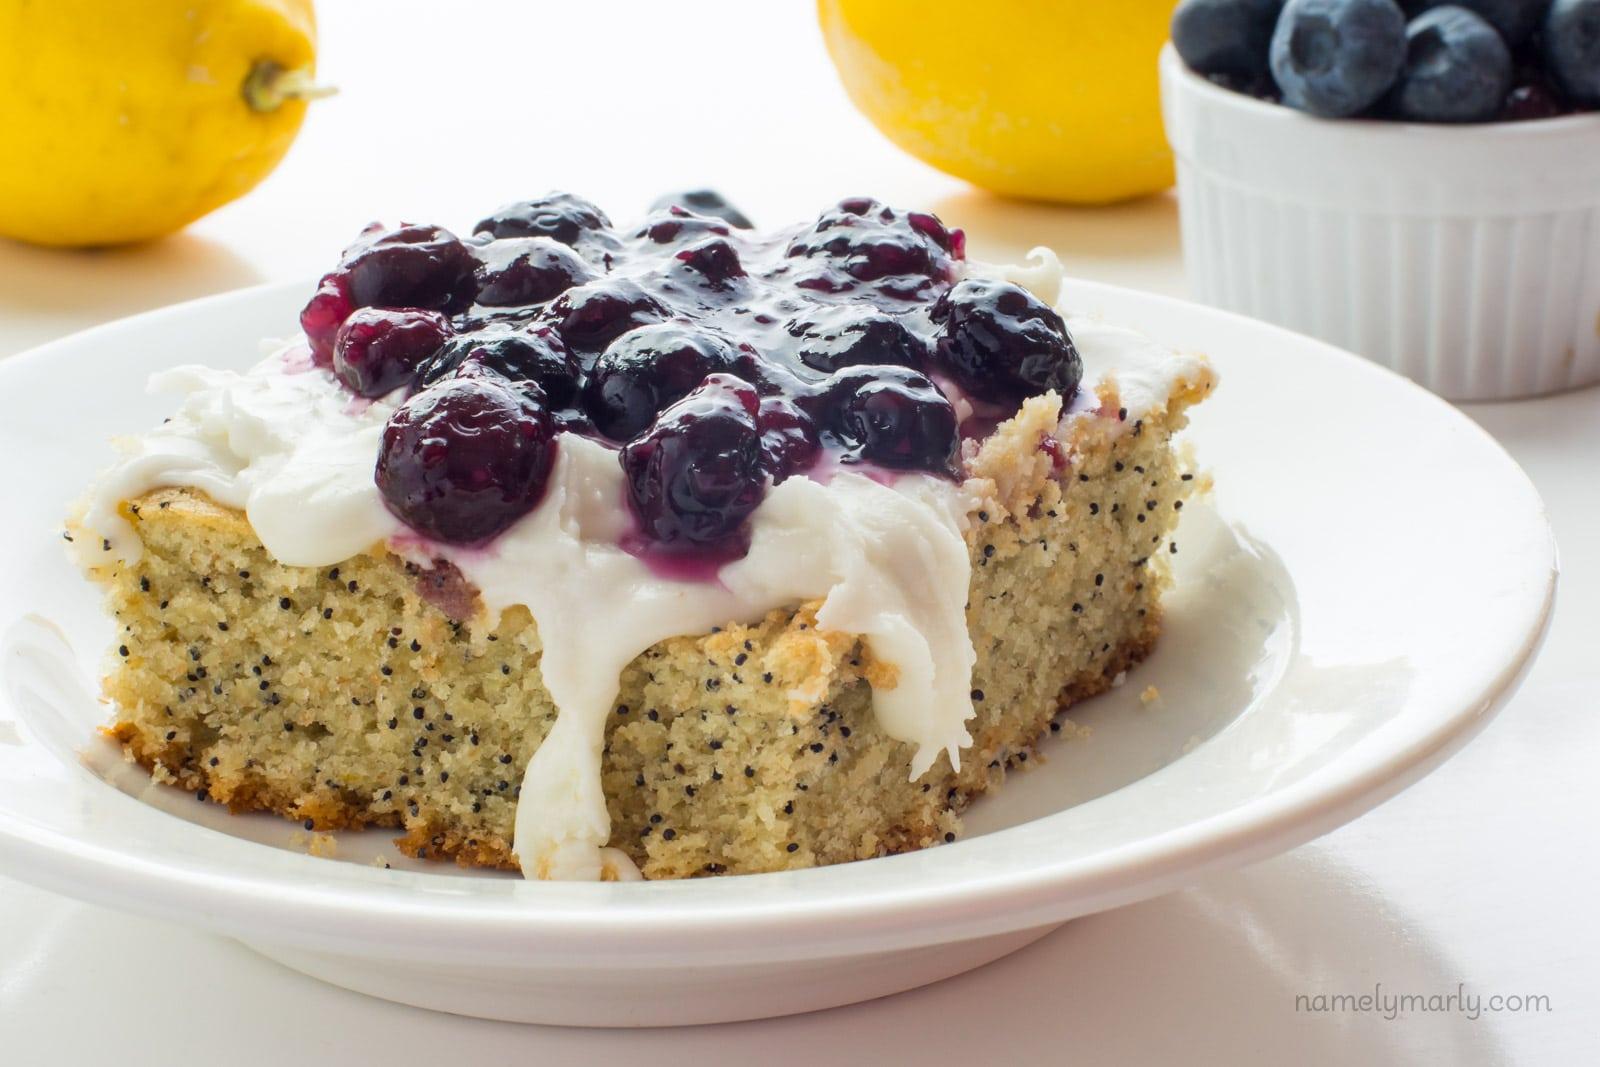 Lemon Avocado Cake with Blueberry Topping